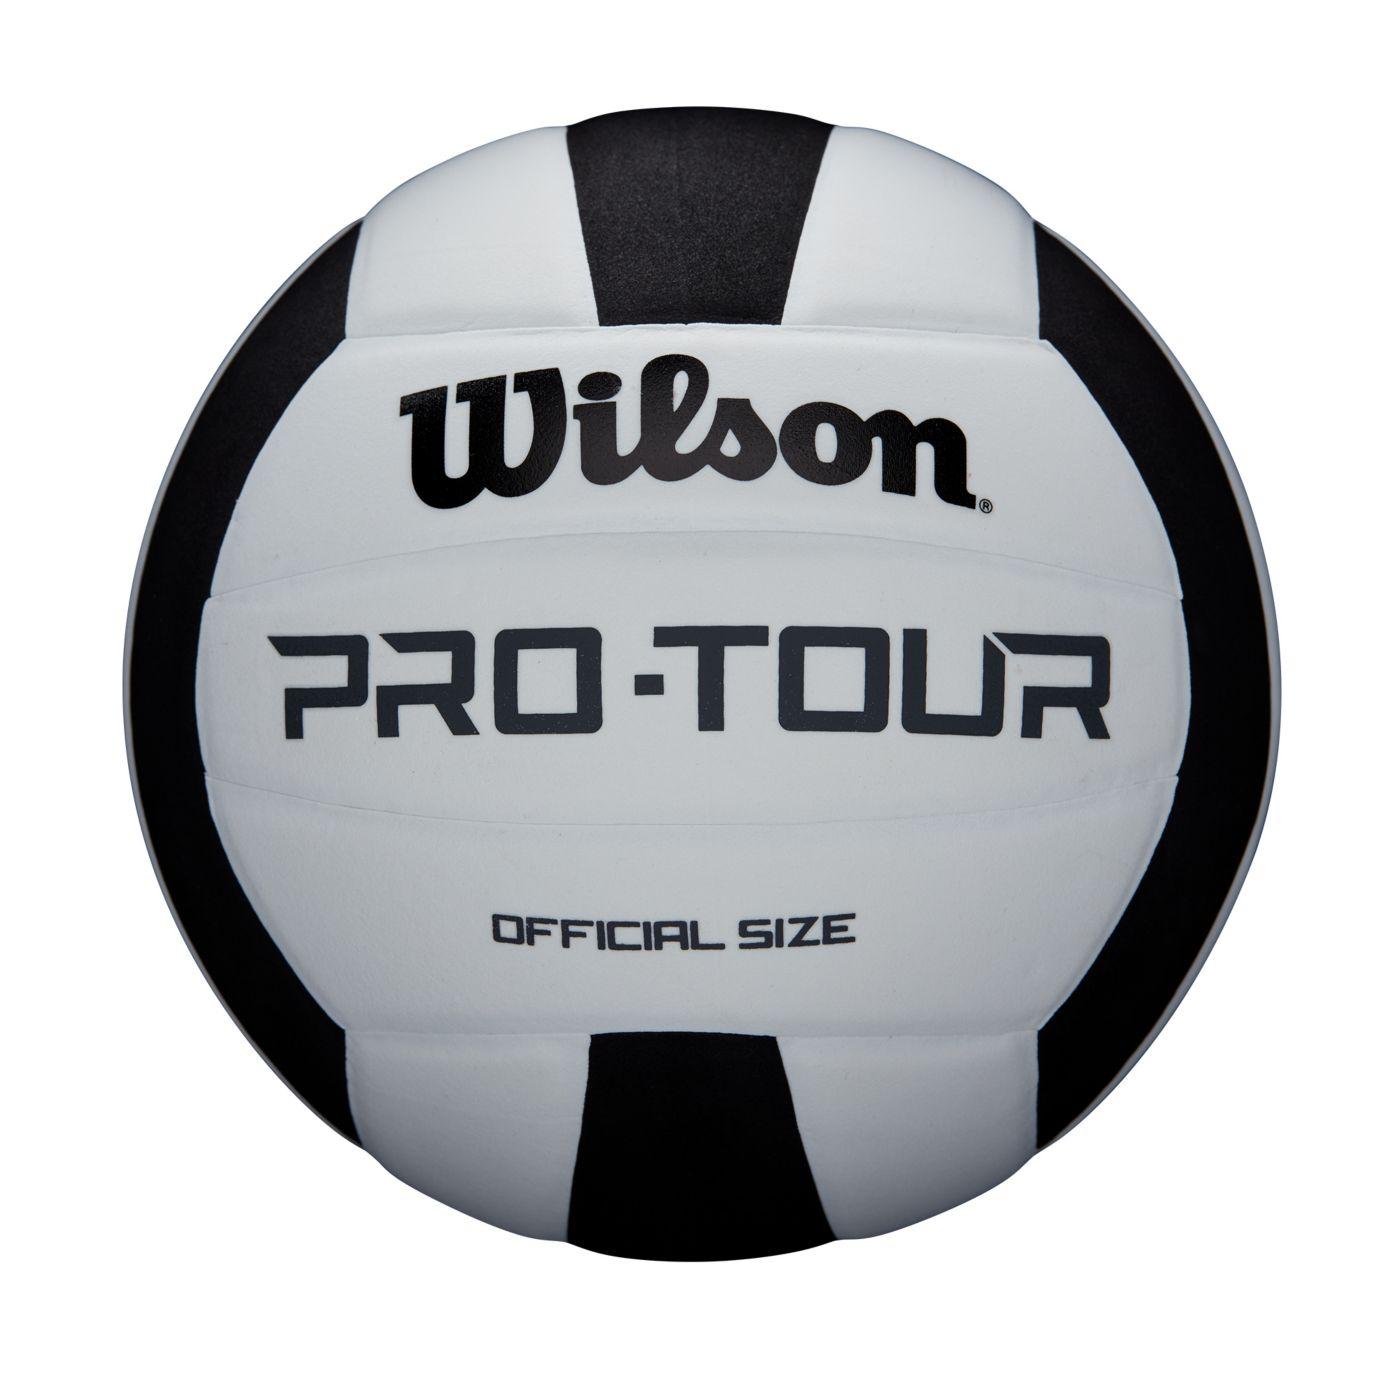 Wilson Pro Tour Indoor Volleyball